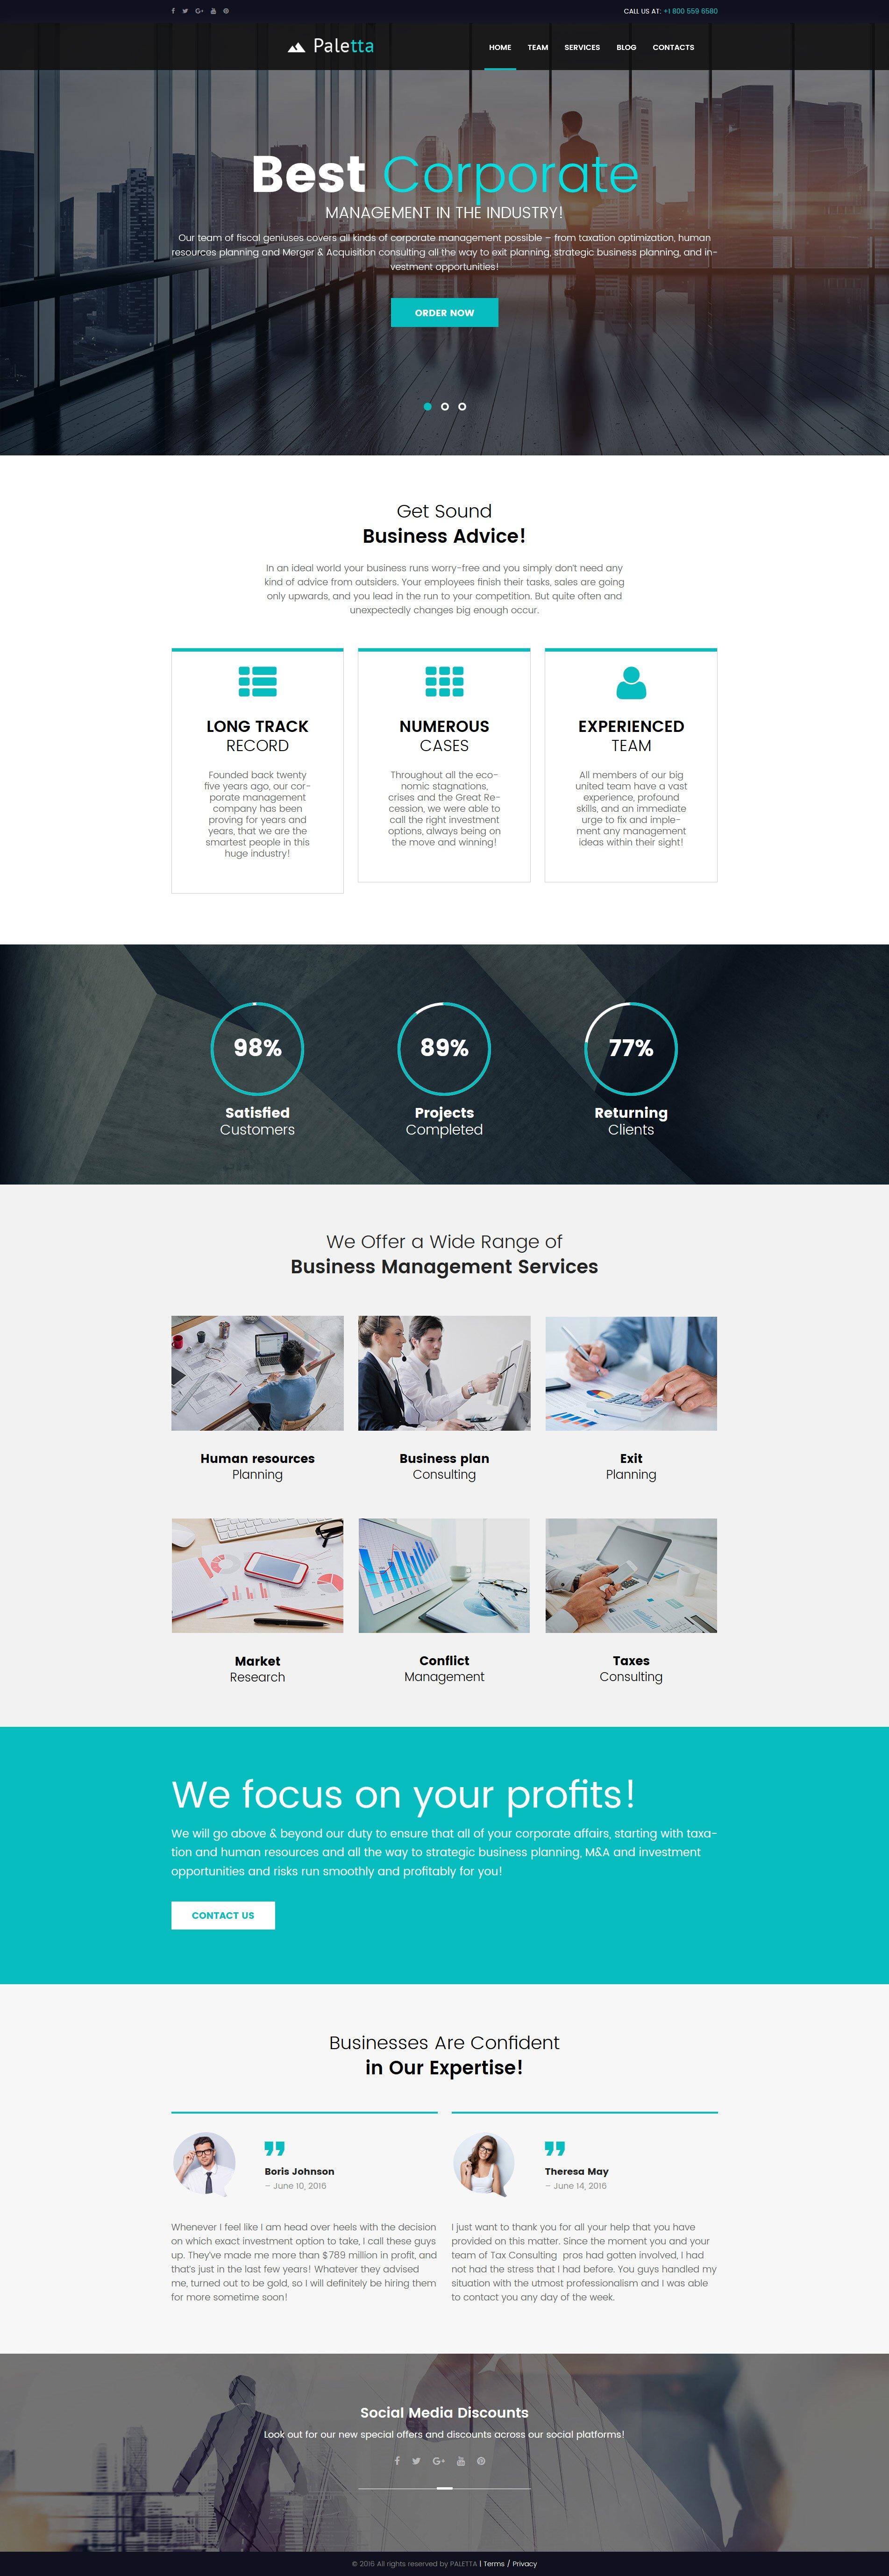 Responsive Paletta - Corporate & Business Wordpress #62119 - Ekran resmi